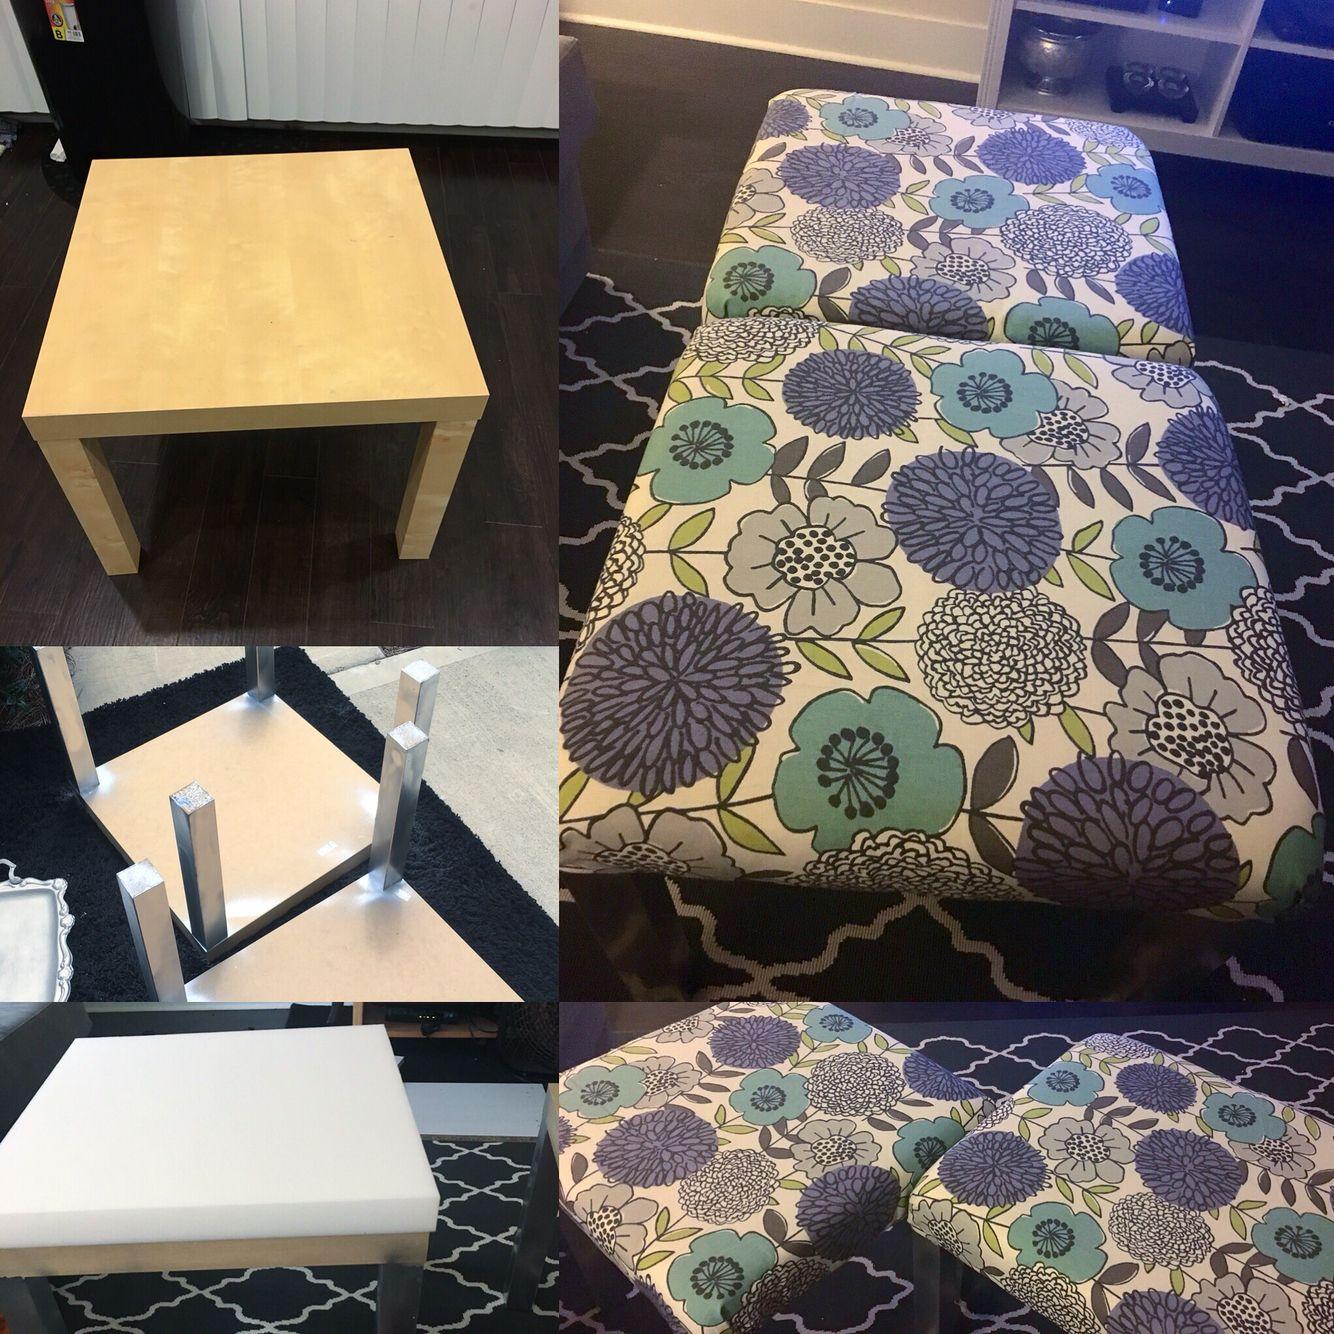 Ottomans From Ikea Lack Side Tables Diy Craftymccrafterson Ikea Lack Table Ikea Lack Coffee Table Ikea Lack [ 1334 x 1334 Pixel ]